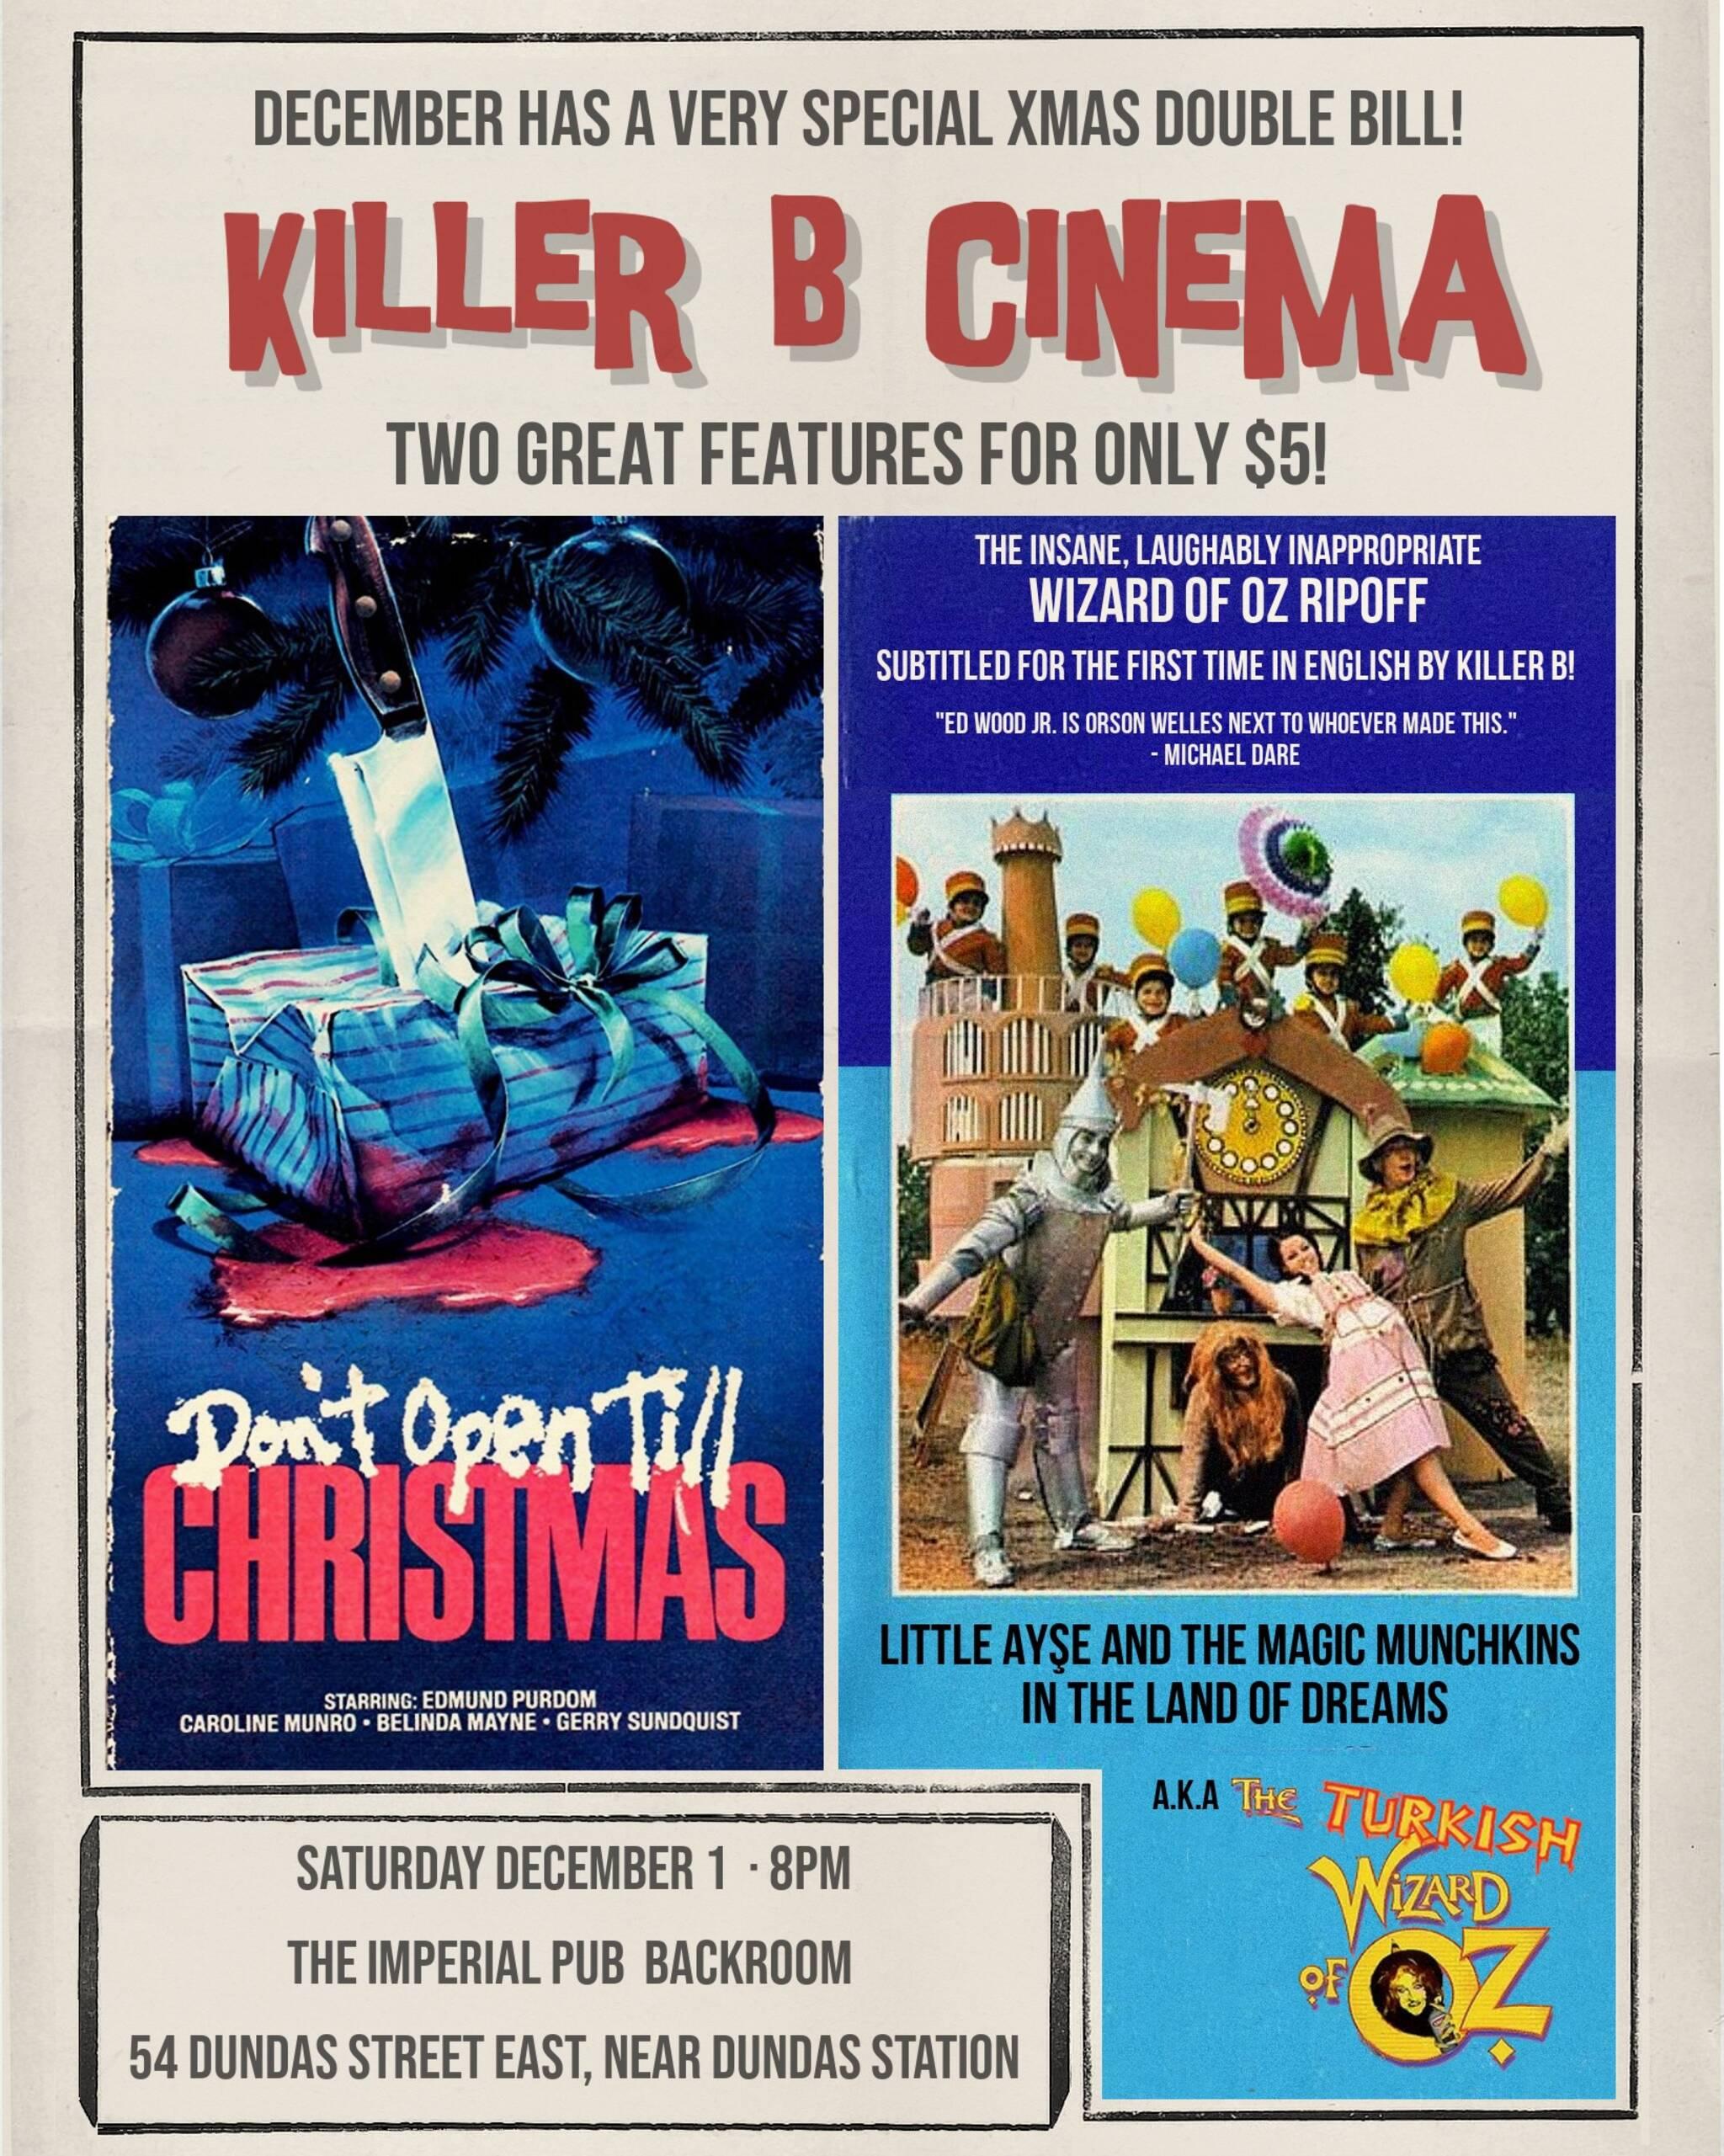 Dont Open Till Christmas.Killer B Cinema Don T Open Till Christmas Turkish Wizard